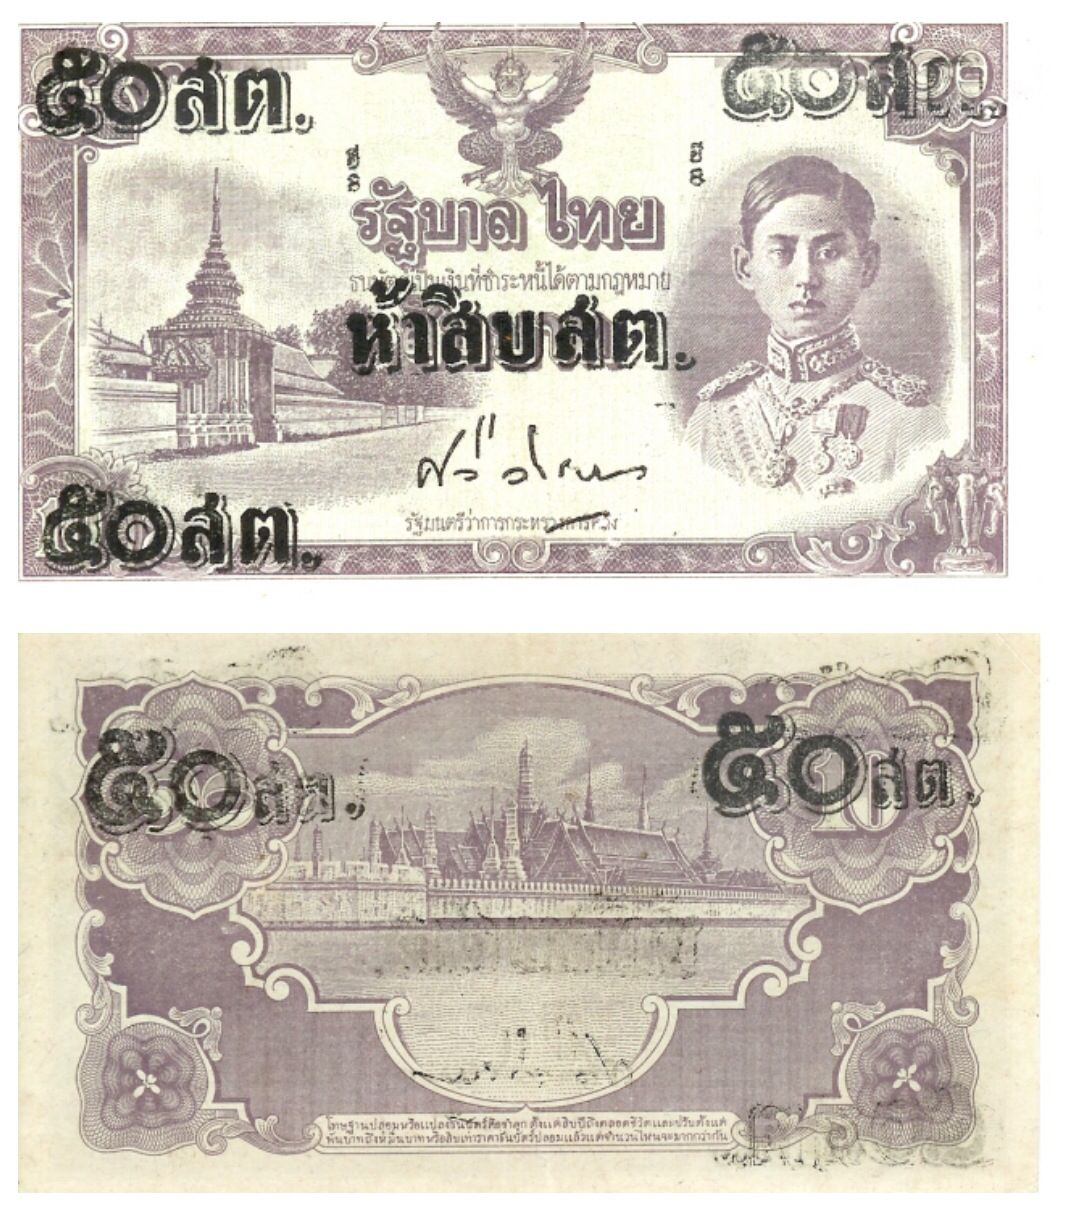 Siam Banknote... http://islandinfokohsamui.com/